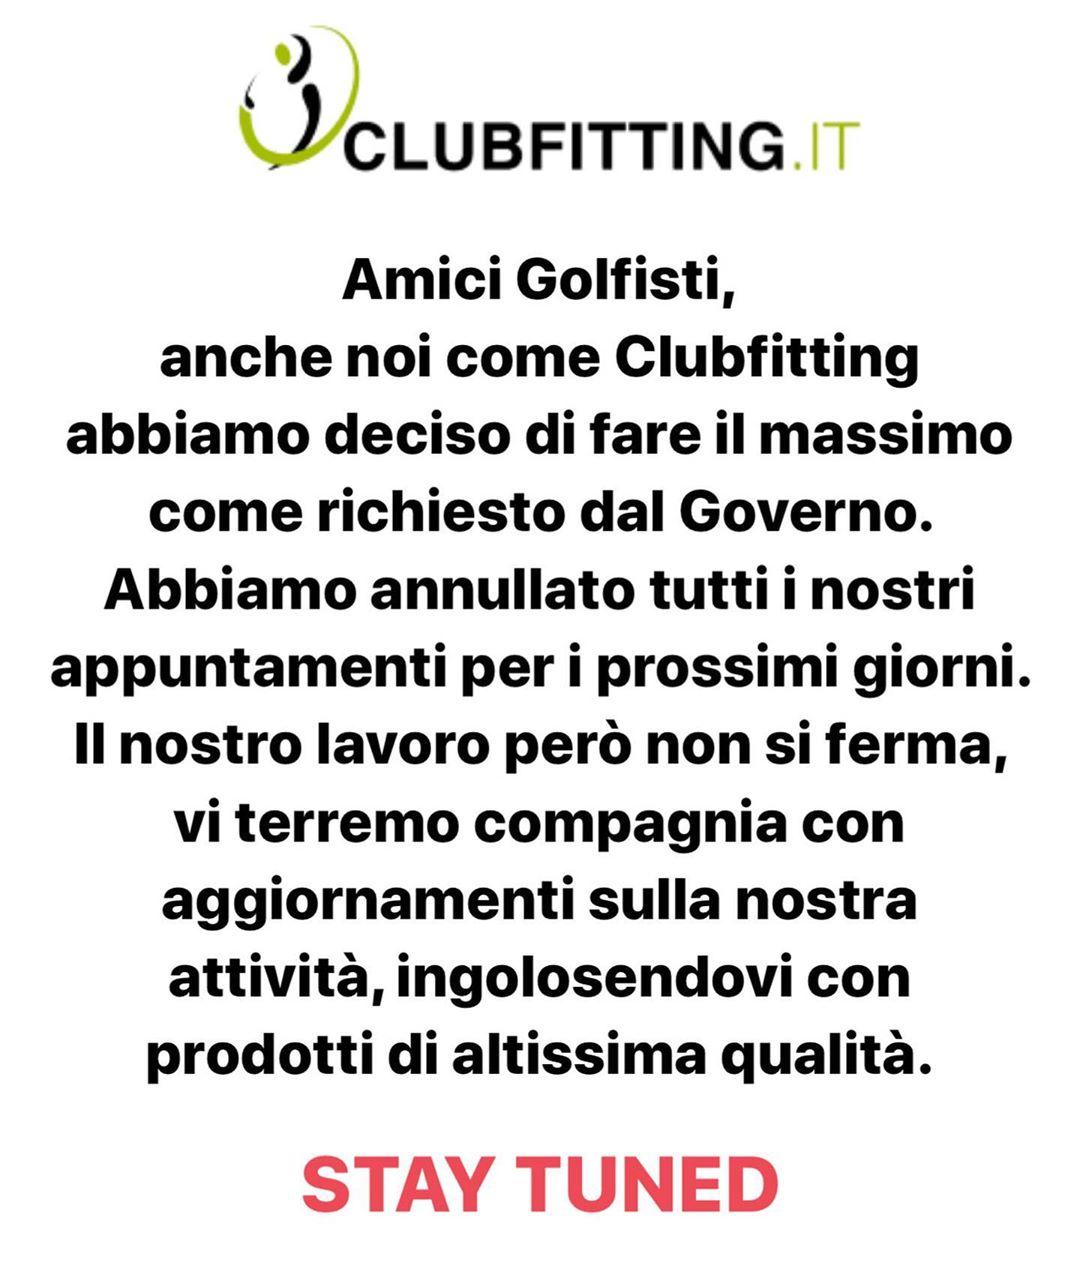 clubfitting